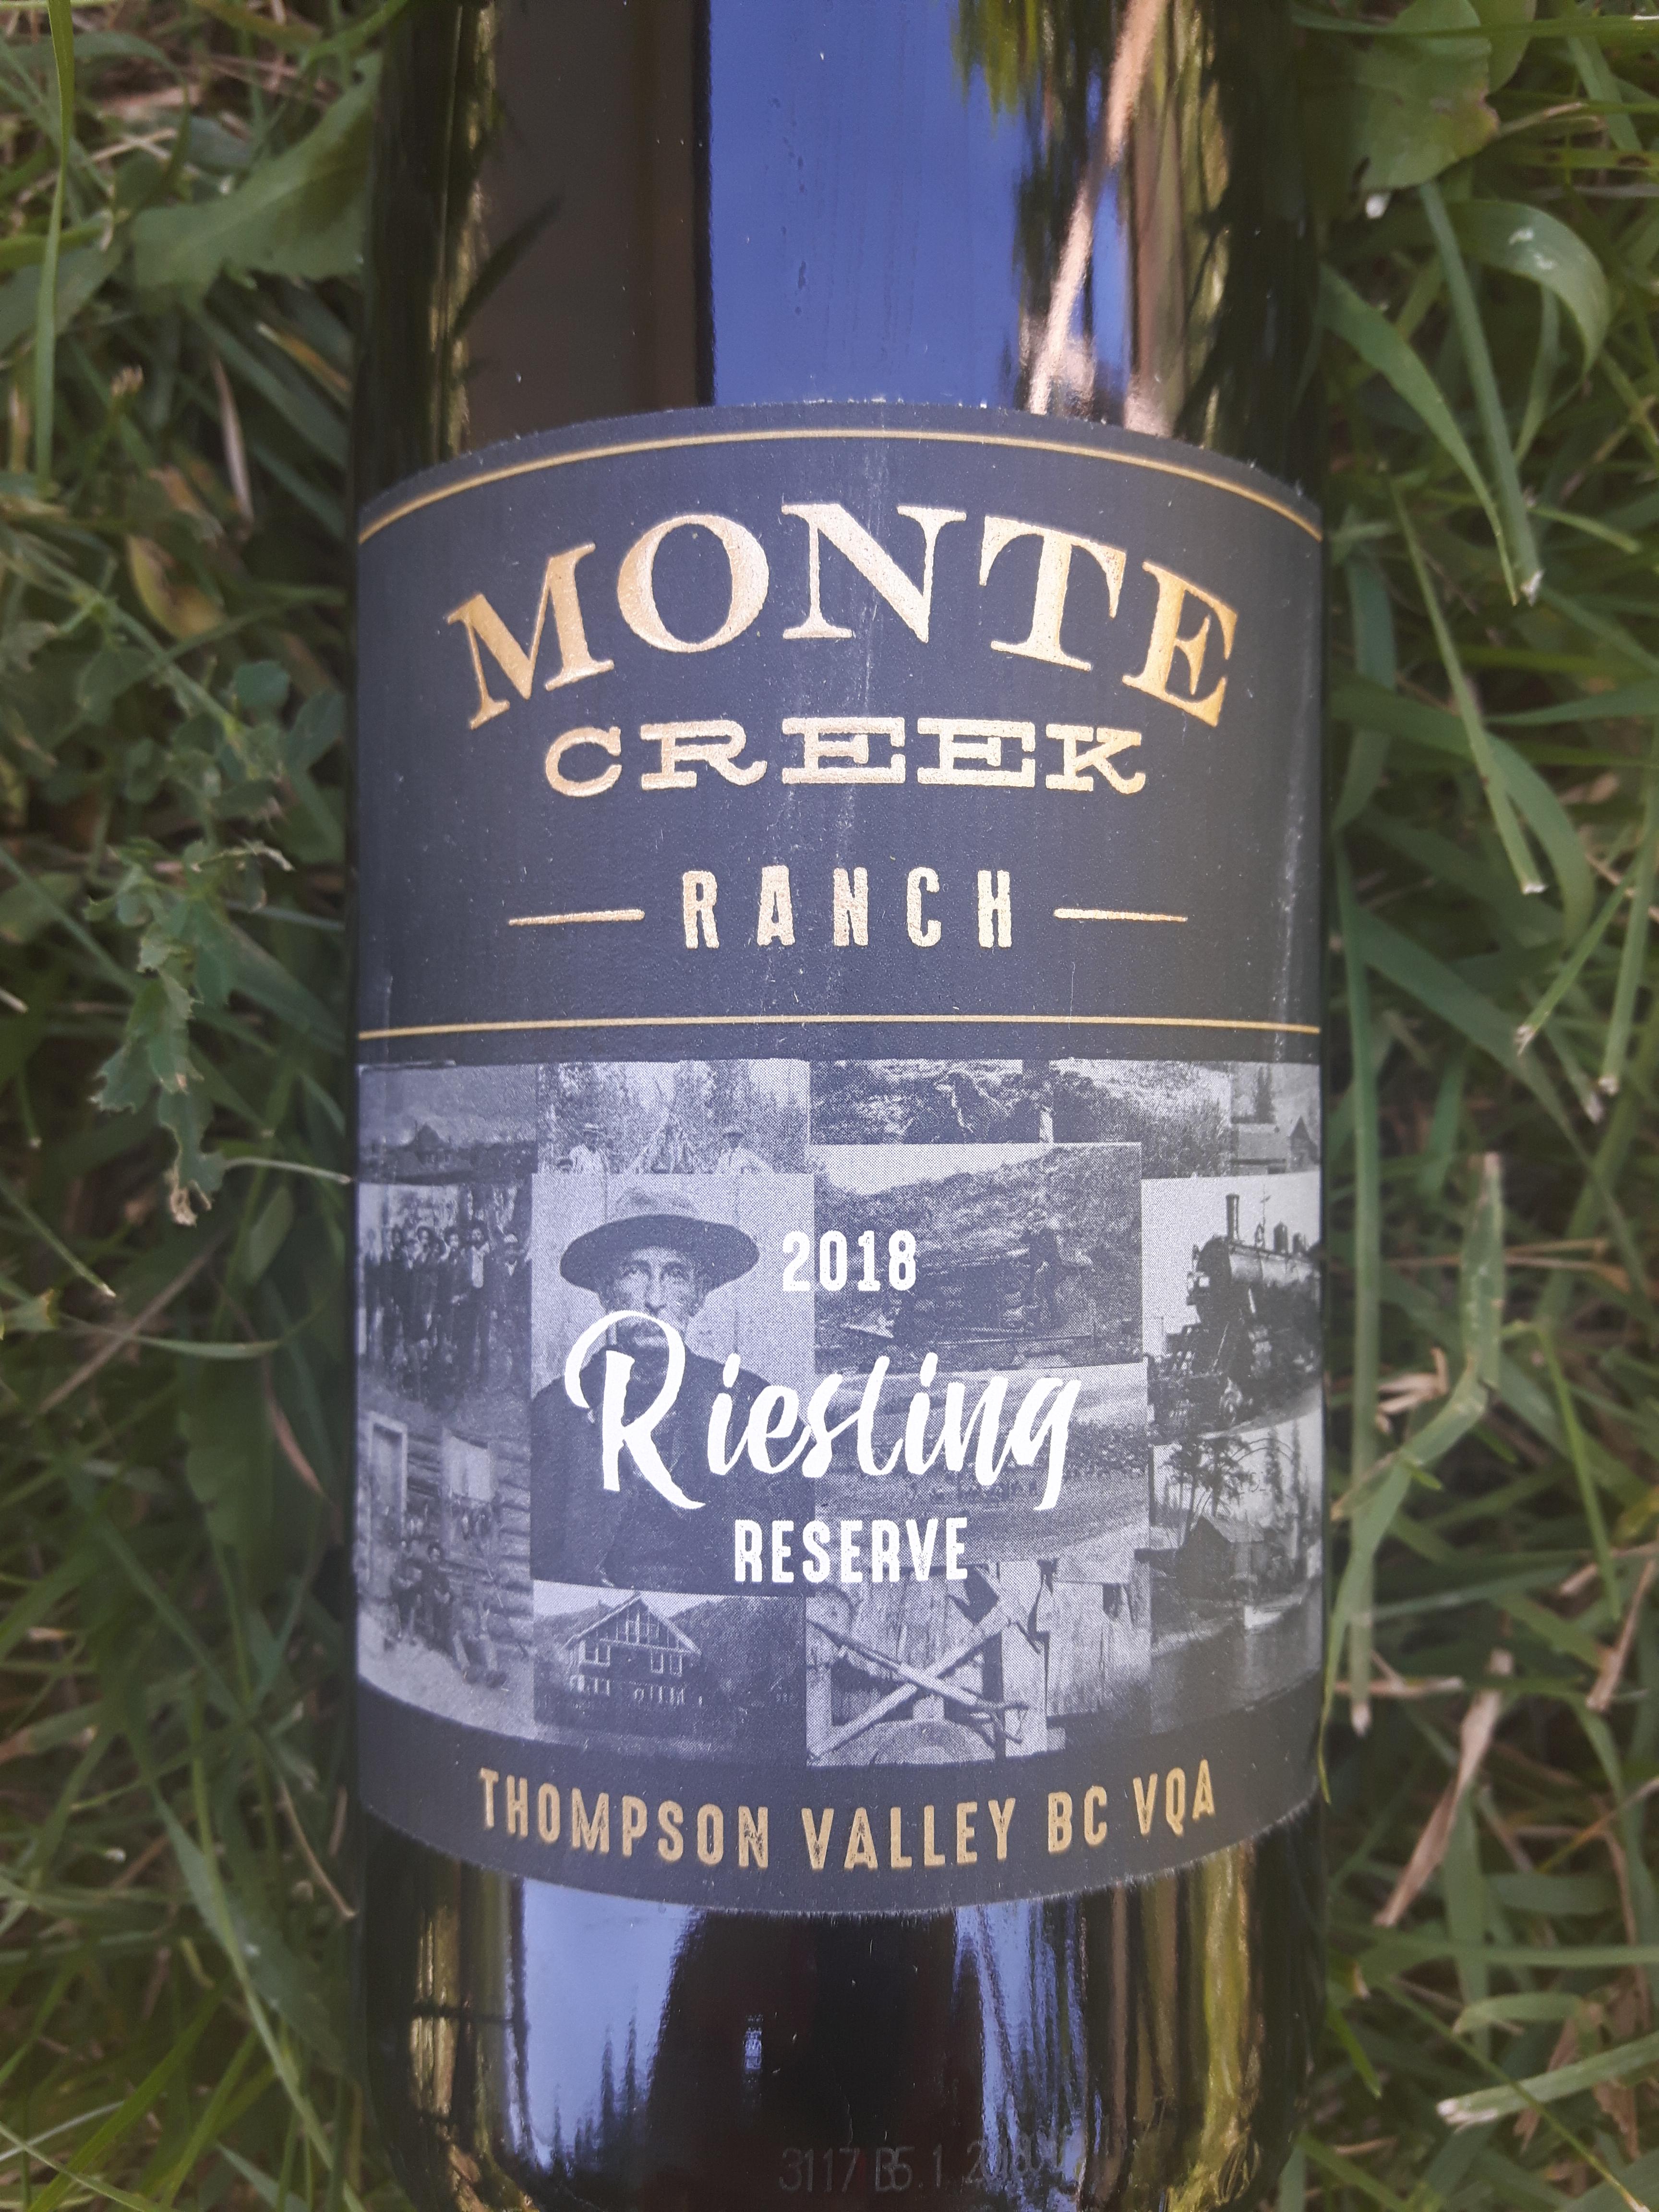 Monte Creek 2018 Reserve Riesling Best Wine Wine 2020 ACWC